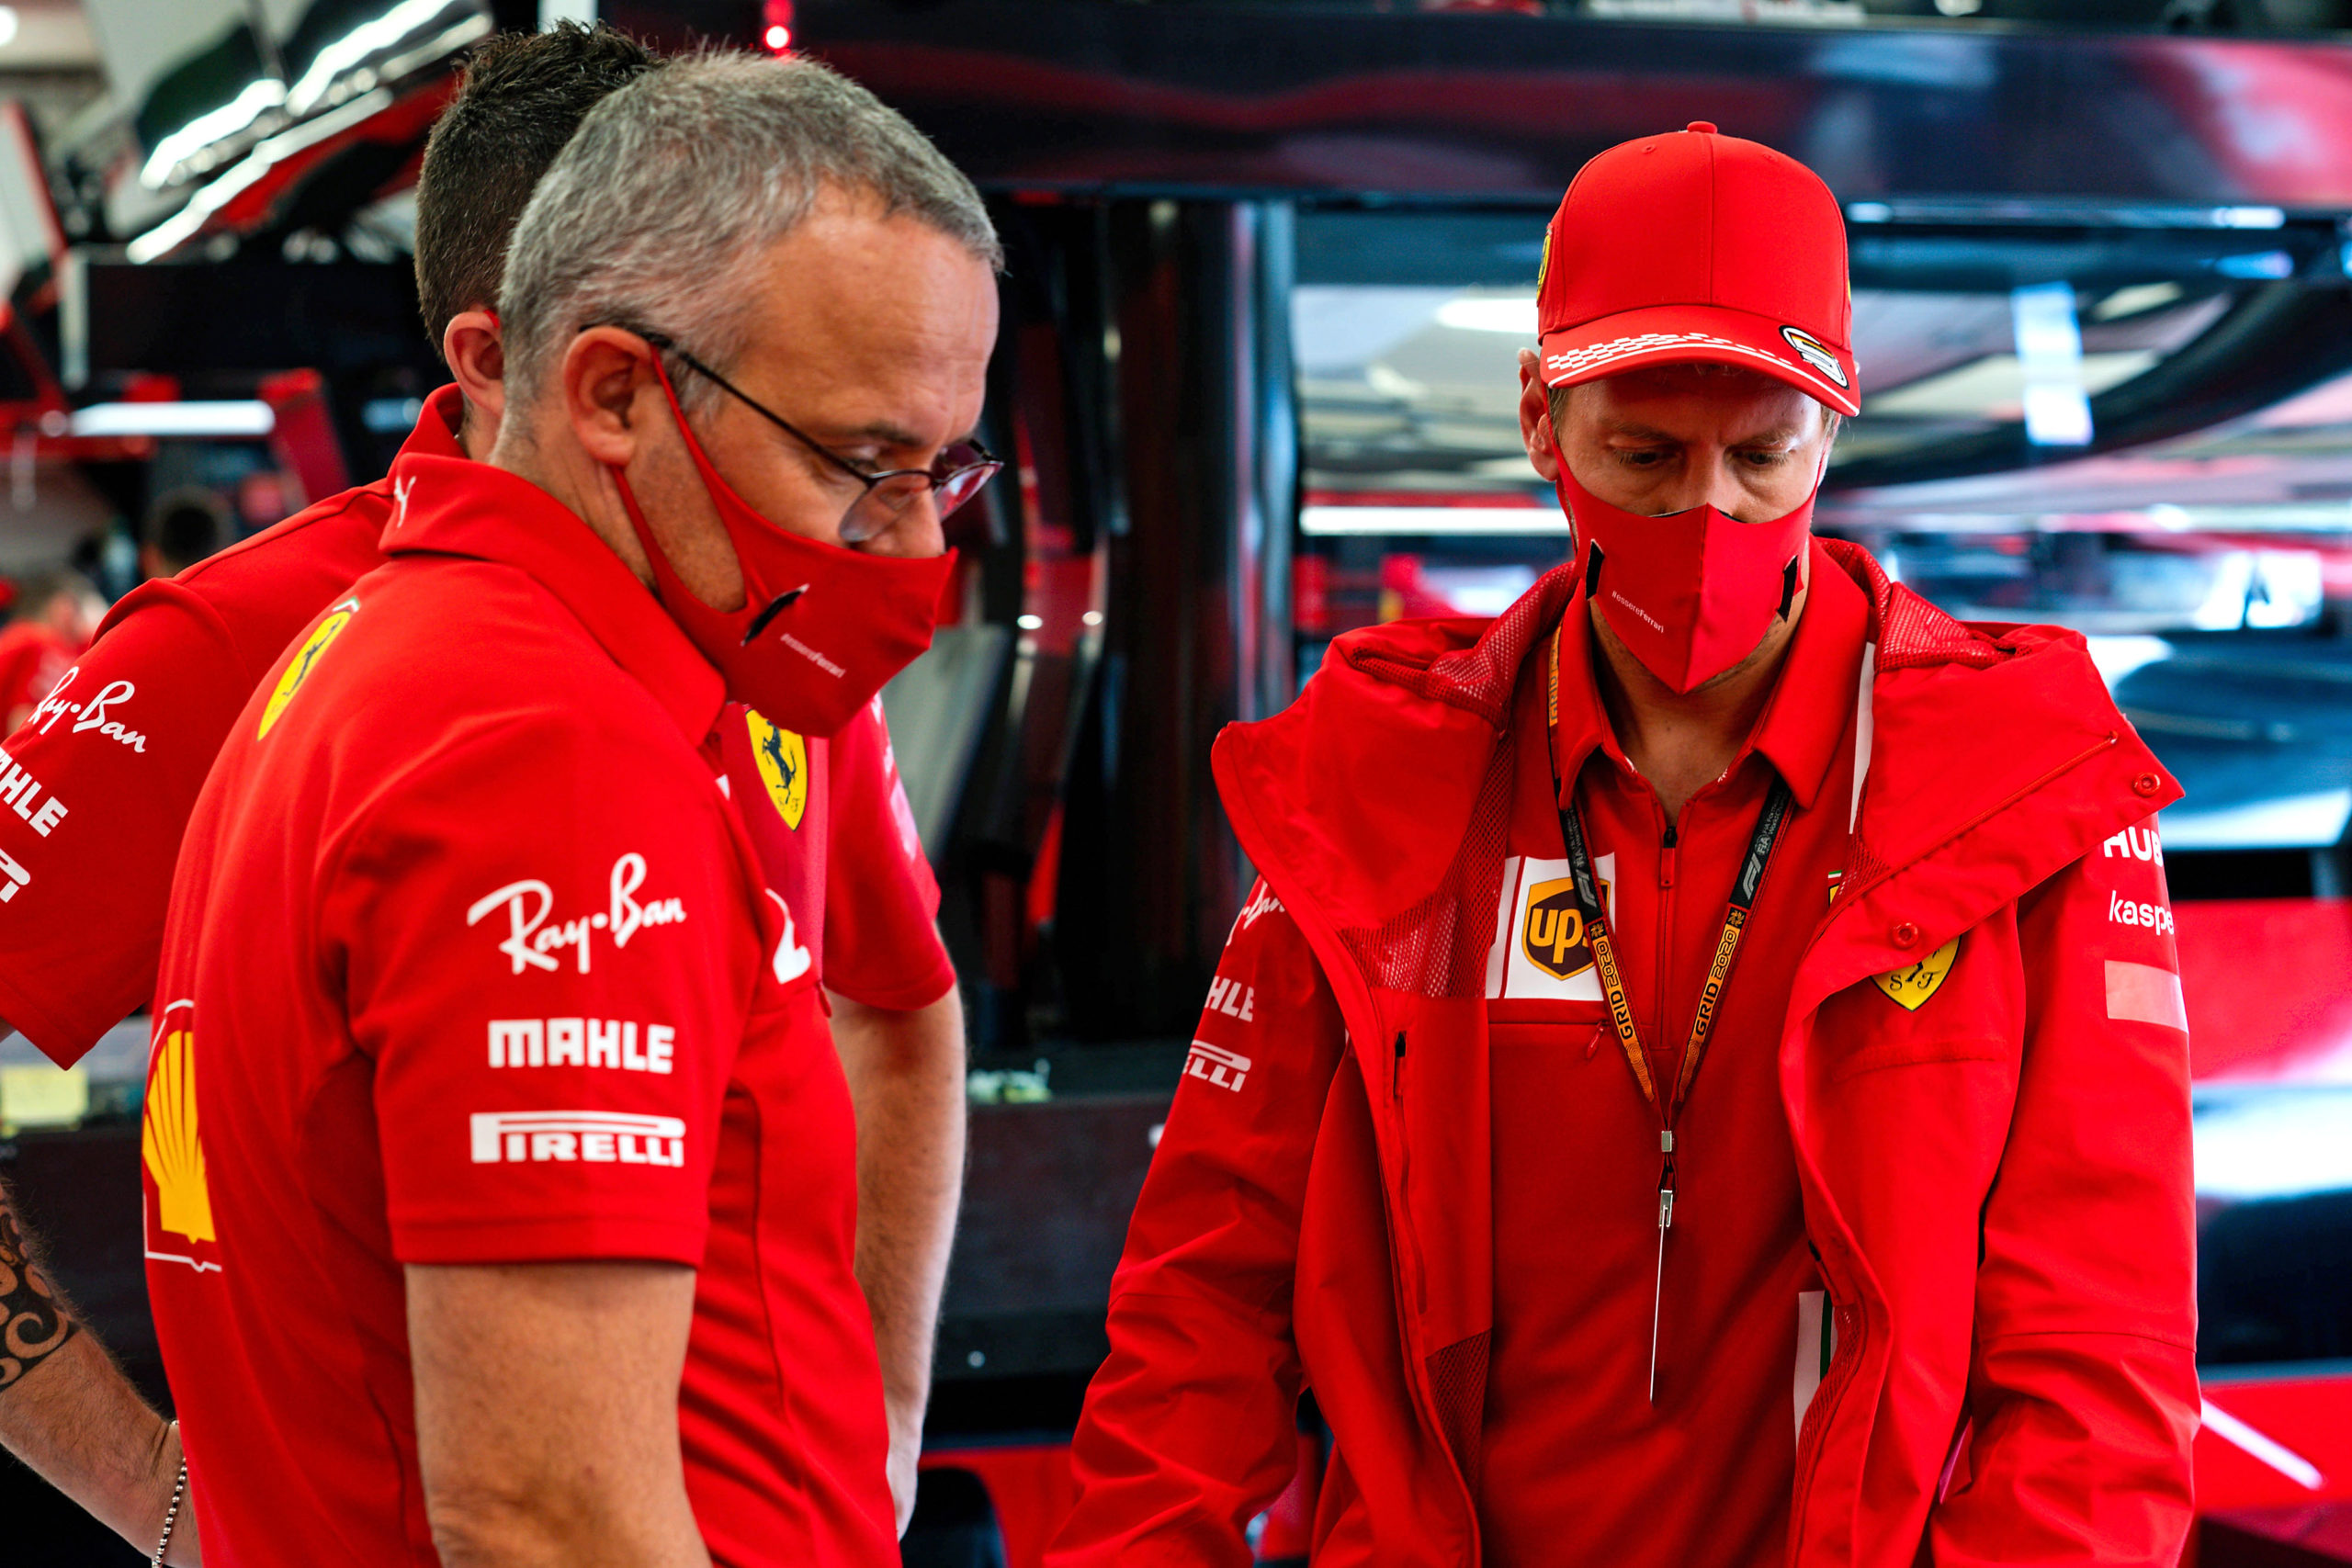 GP UNGHERIA  F1/2020 -  GIOVEDÌ 16/07/2020        credit: @Scuderia Ferrari Press Office, Vettel